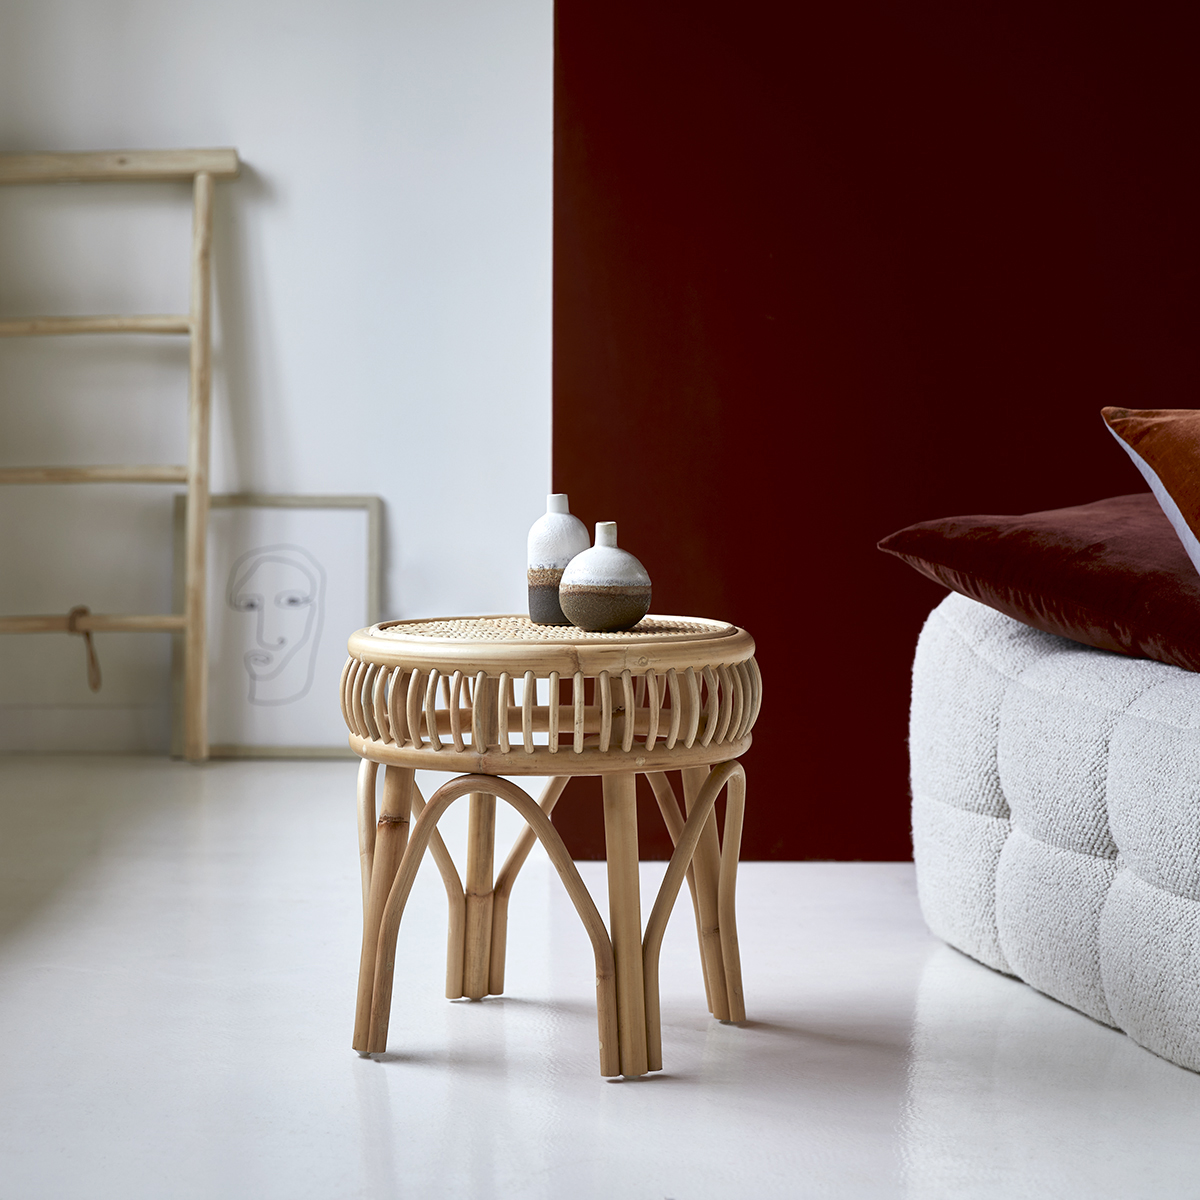 Zita rattan Side table